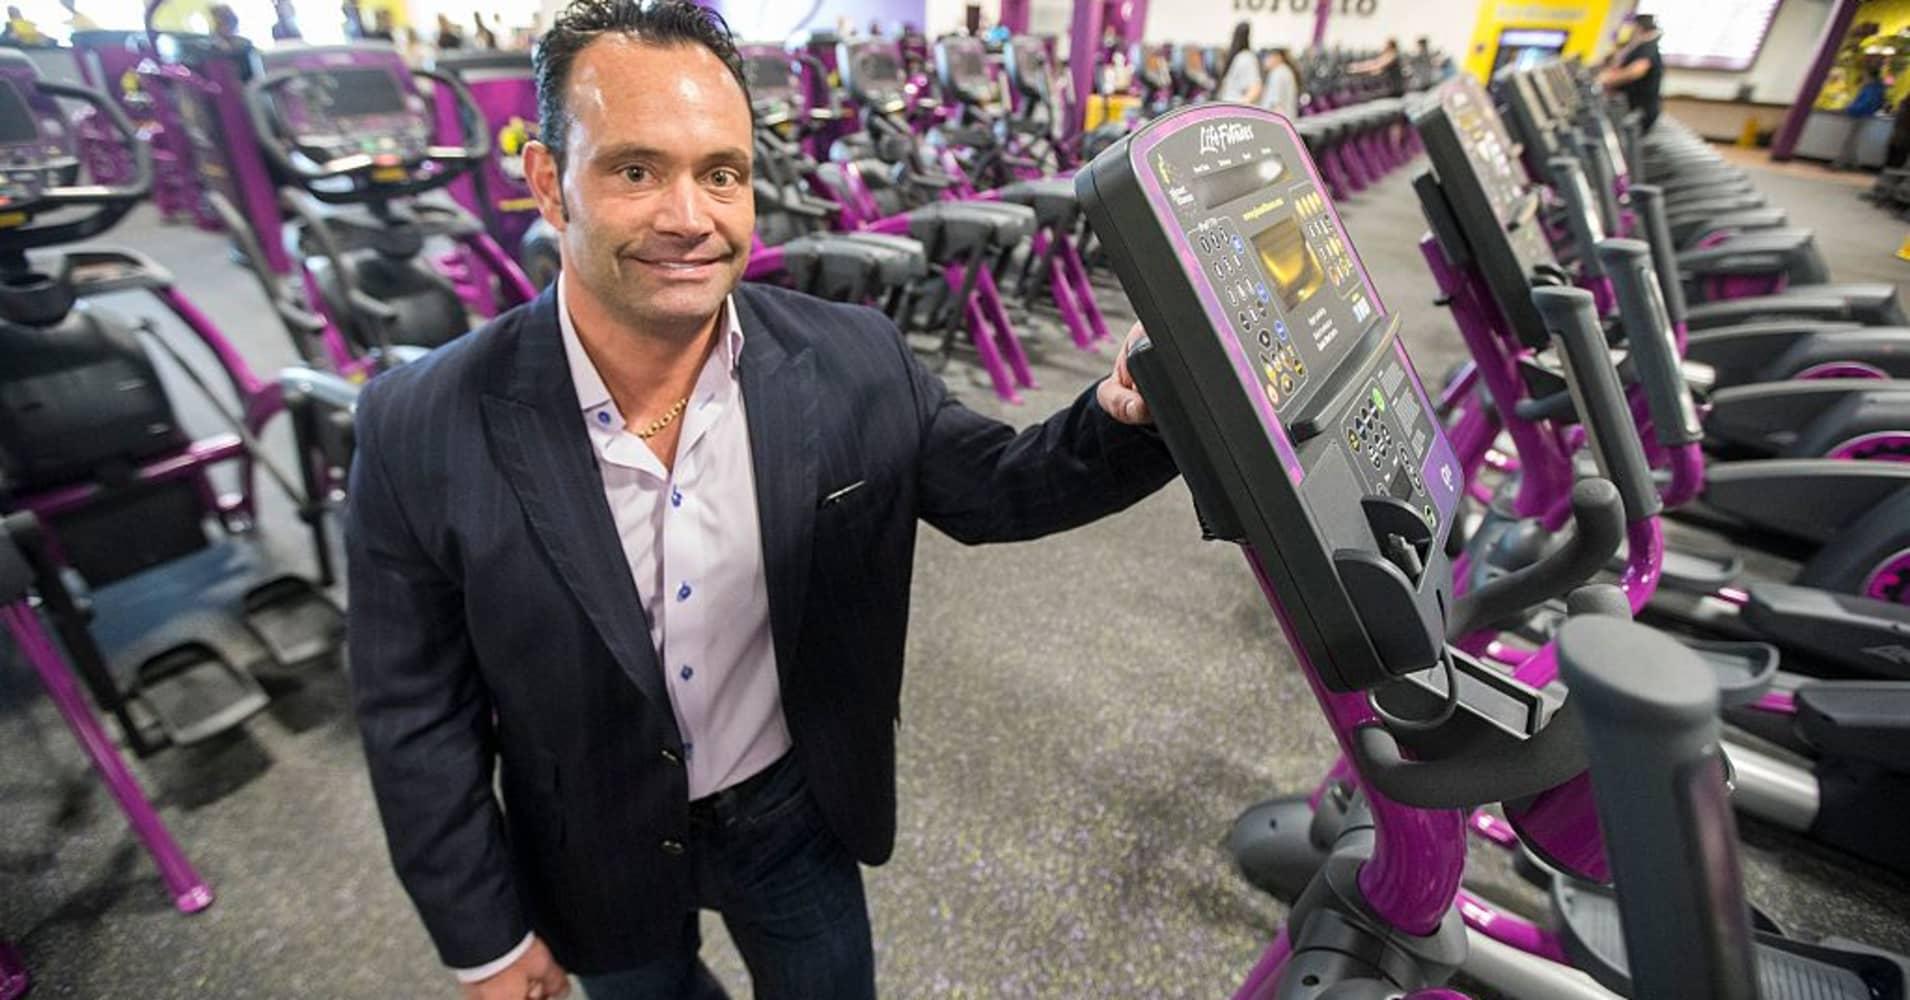 Planet fitness ceo gym franchise runs on being a marketing machine buycottarizona Choice Image